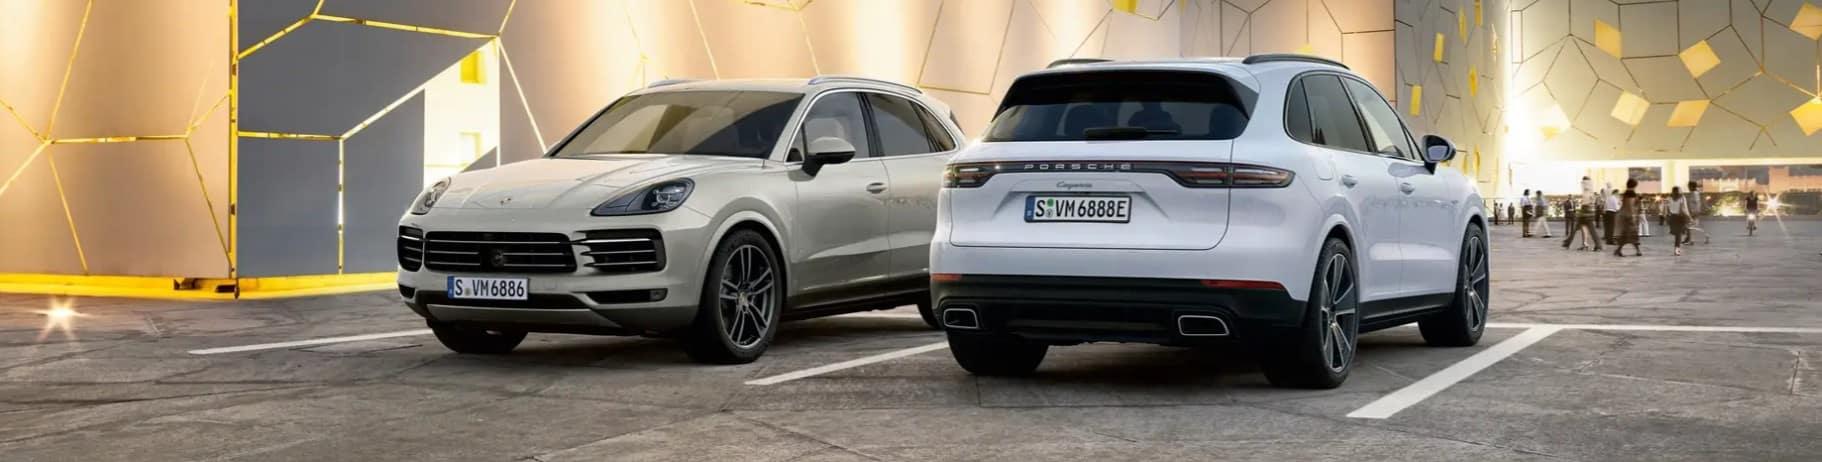 2021 Porsche Cayenne Models